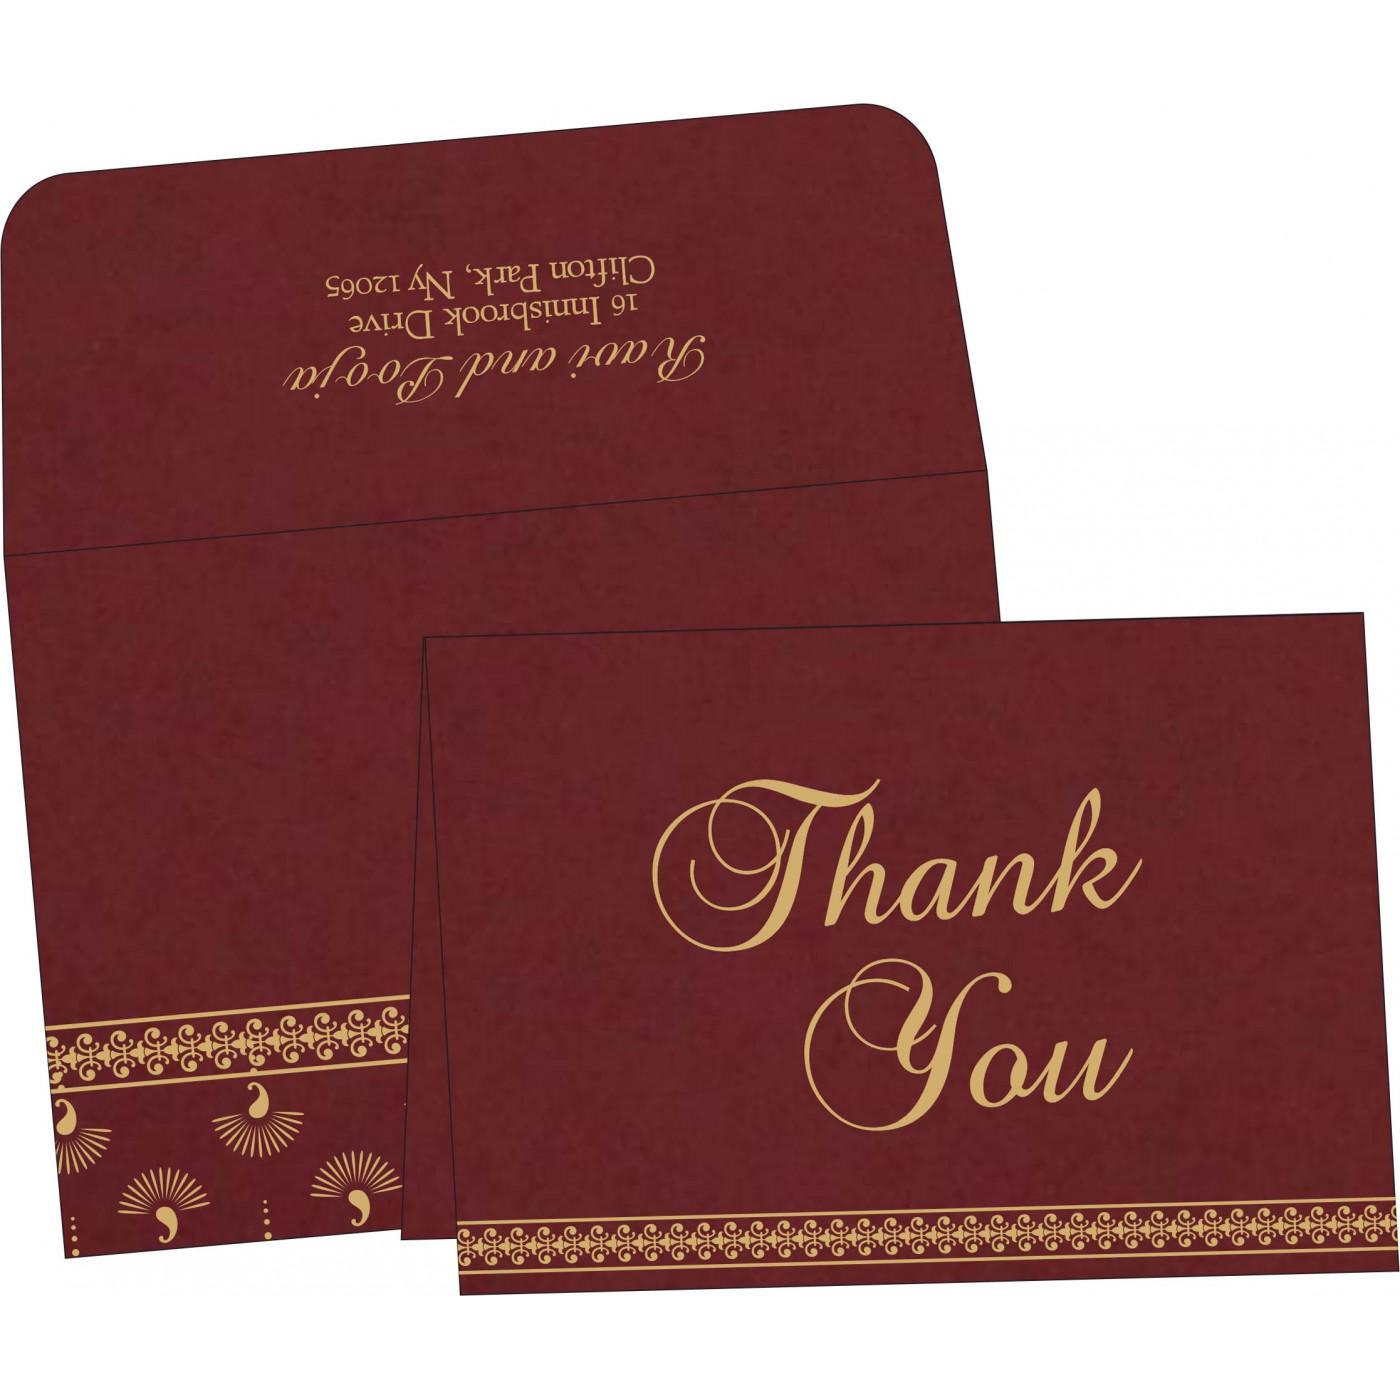 Thank You Cards : TYC-8247D - 123WeddingCards